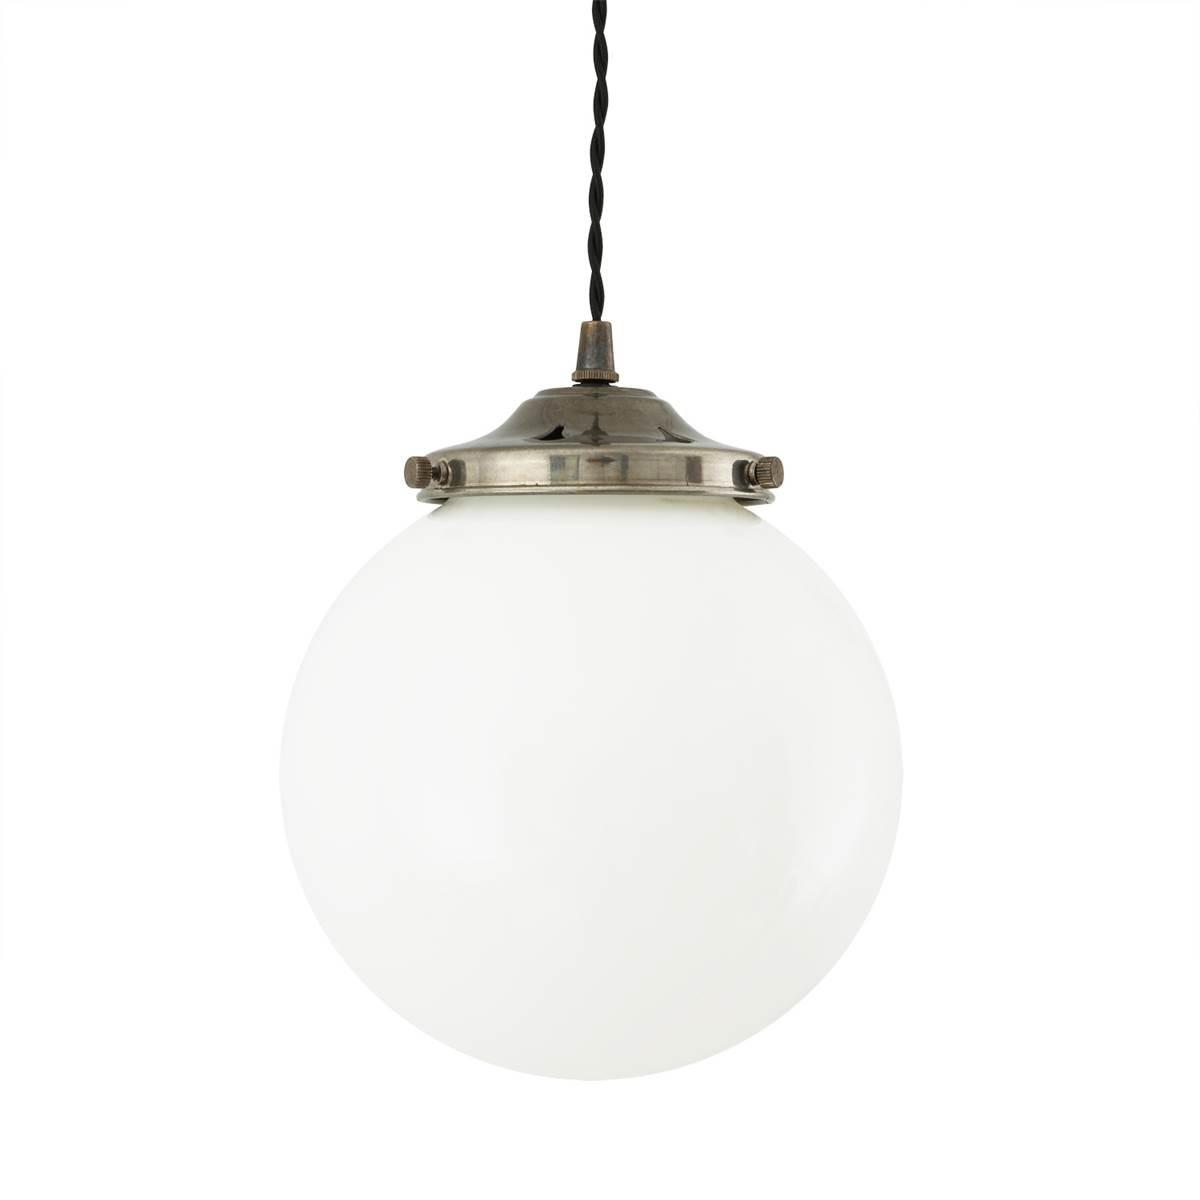 Gentry Opal Globe Pendant Light, 20cm Antique Silver